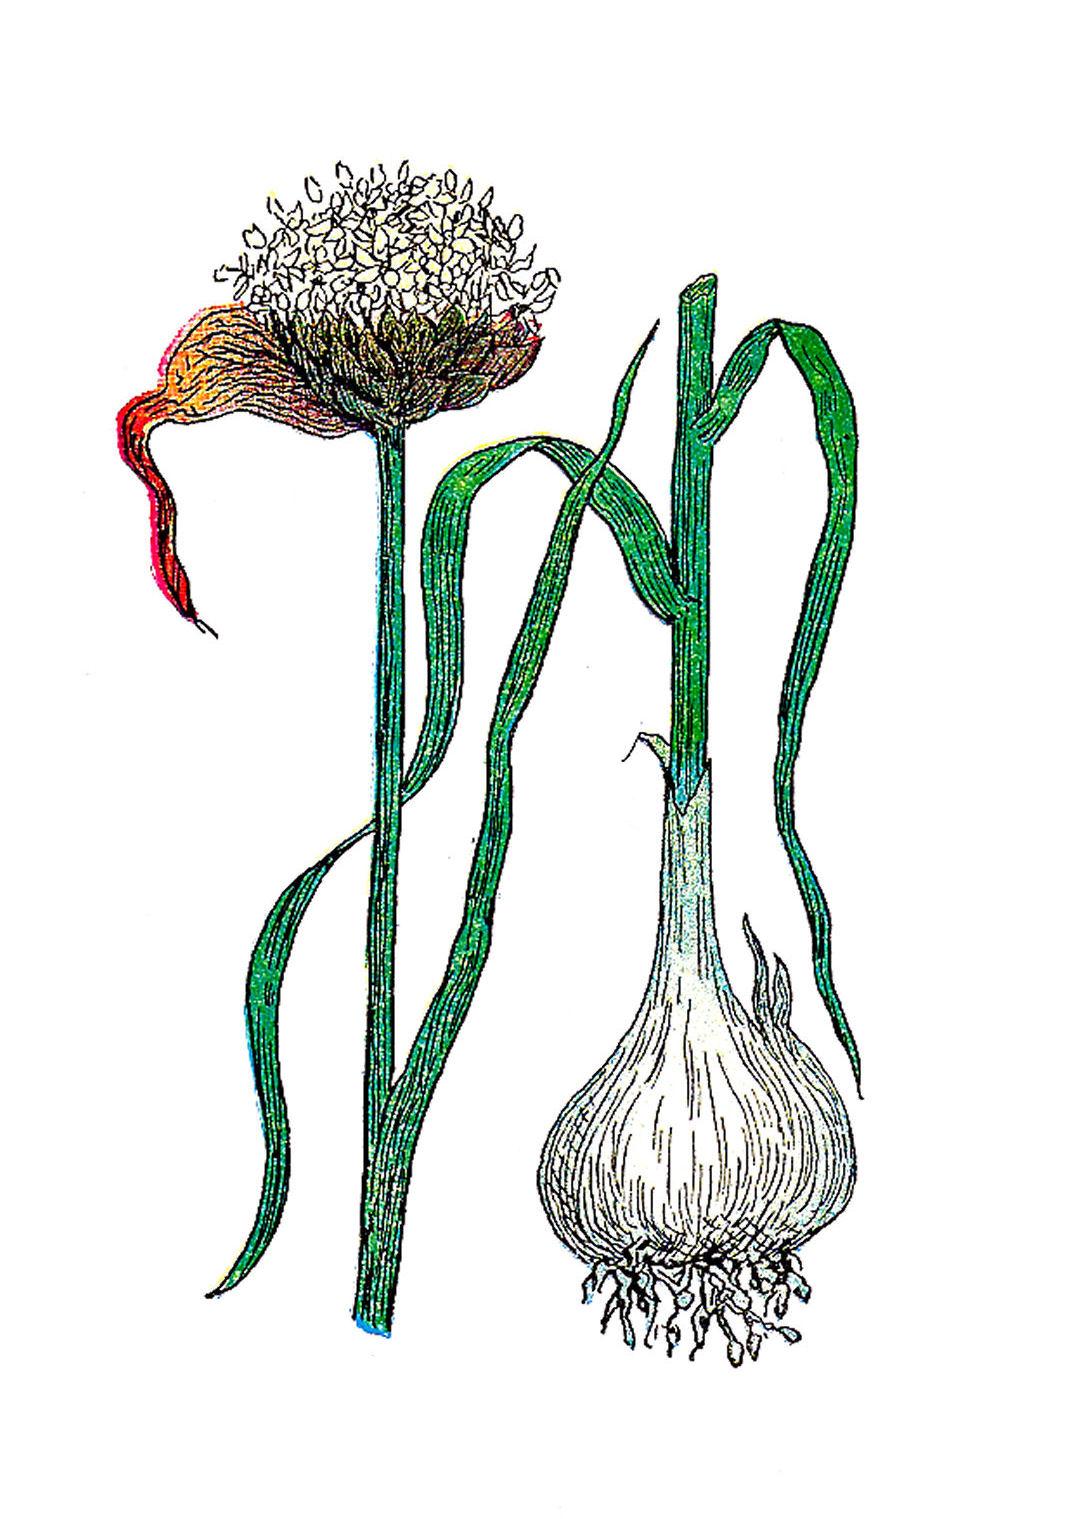 antique images  free botanical graphic  vintage illustration of garlic plant